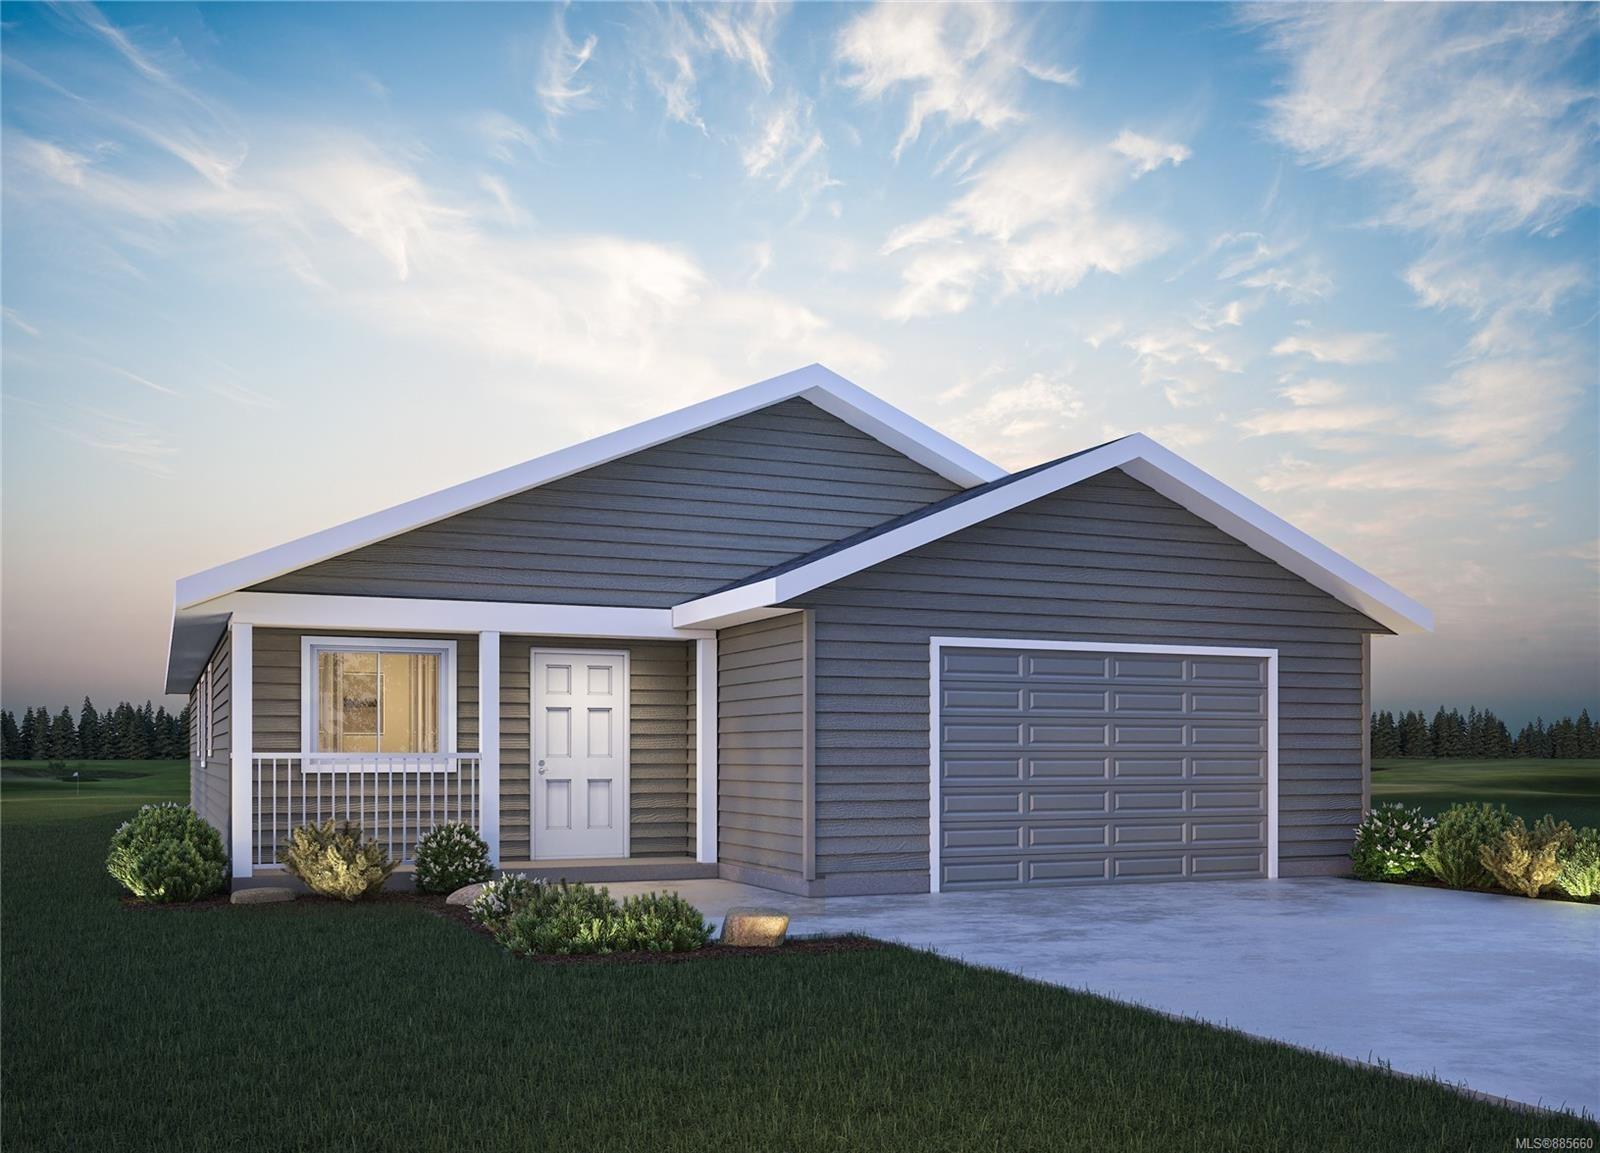 Main Photo: 657 Yambury Rd in : PQ Qualicum Beach House for sale (Parksville/Qualicum)  : MLS®# 885660